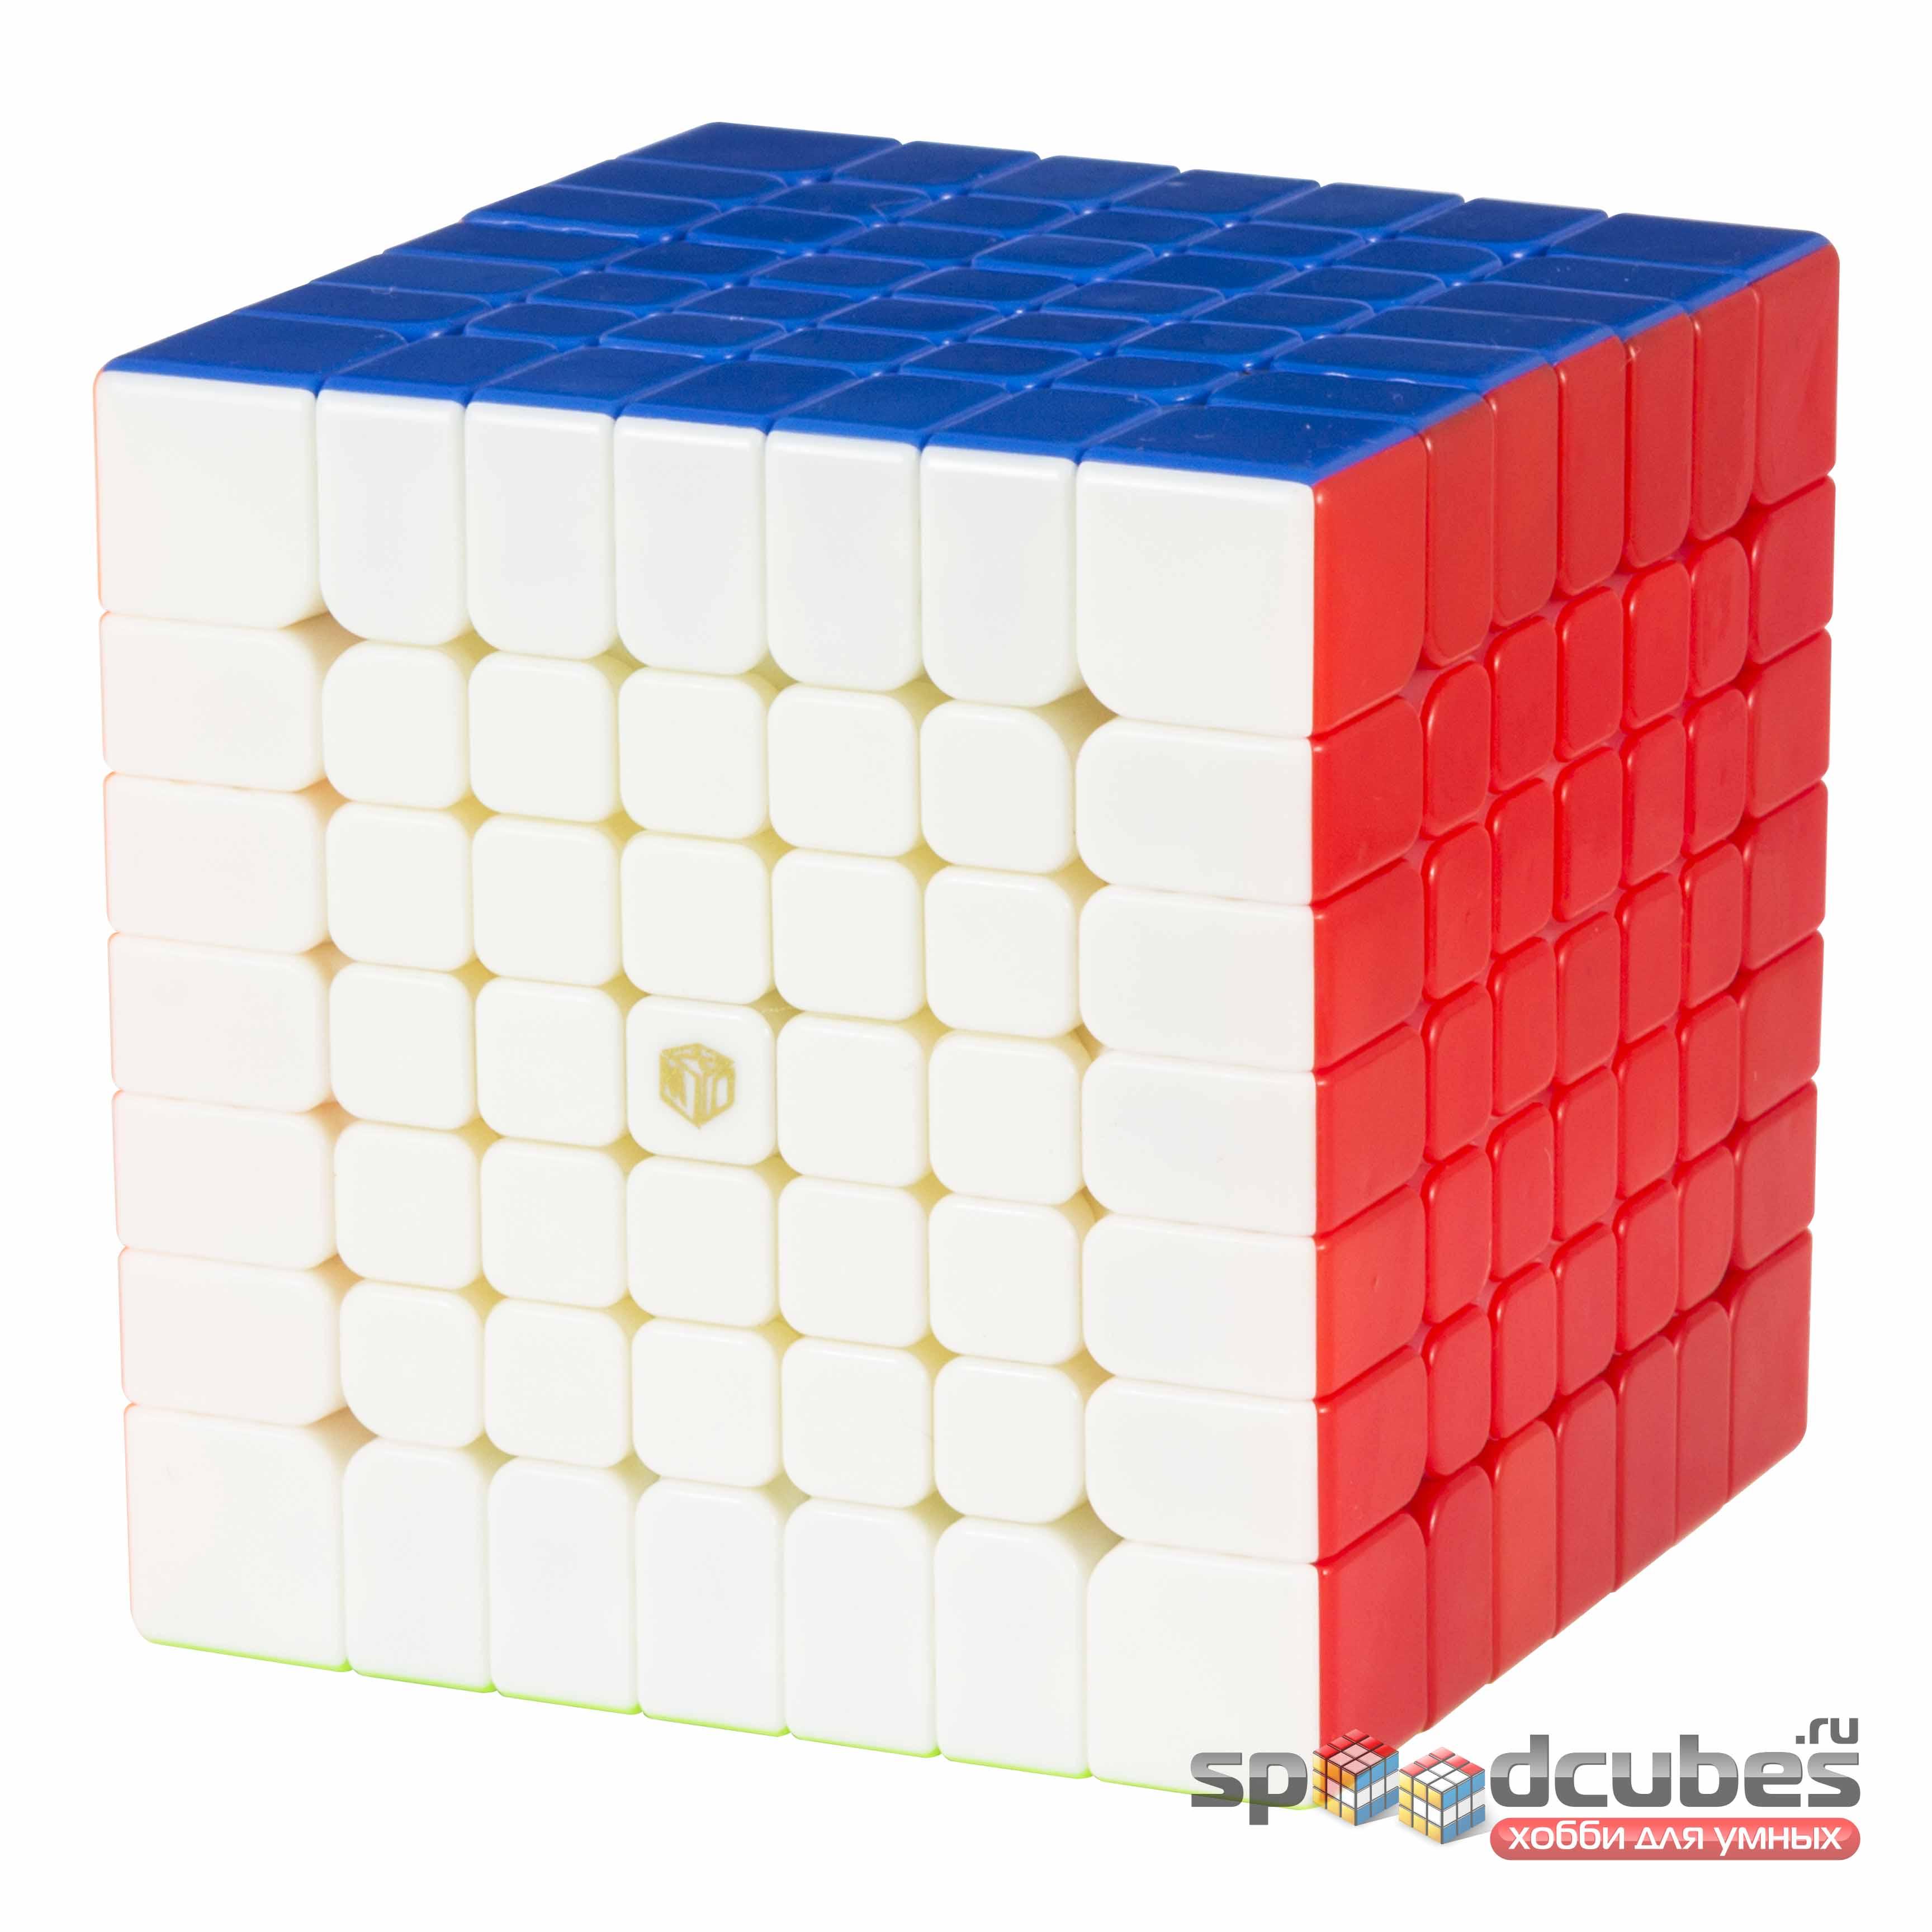 QiYi (MoFangGe) 7x7x7 Spark M